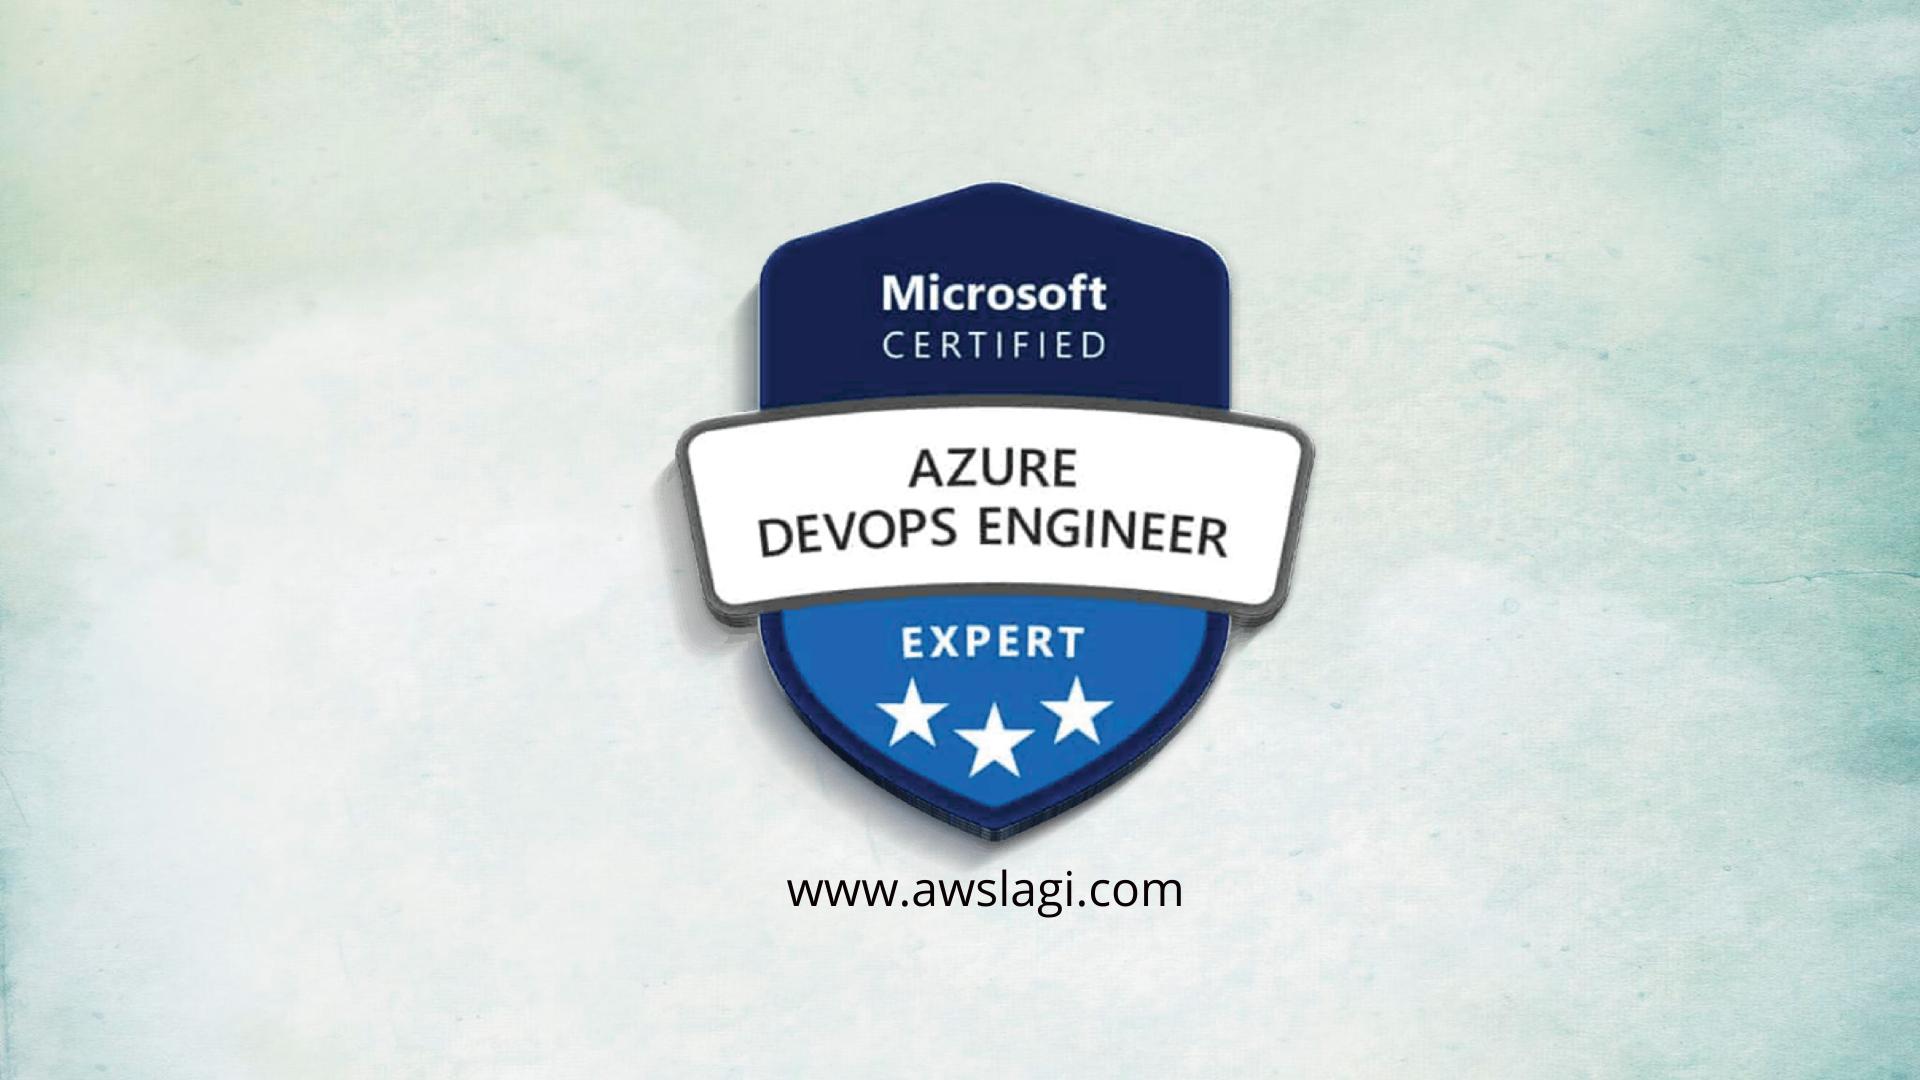 microsoft-azure-certified-devops-engineer-az-400-actual-exam-logo